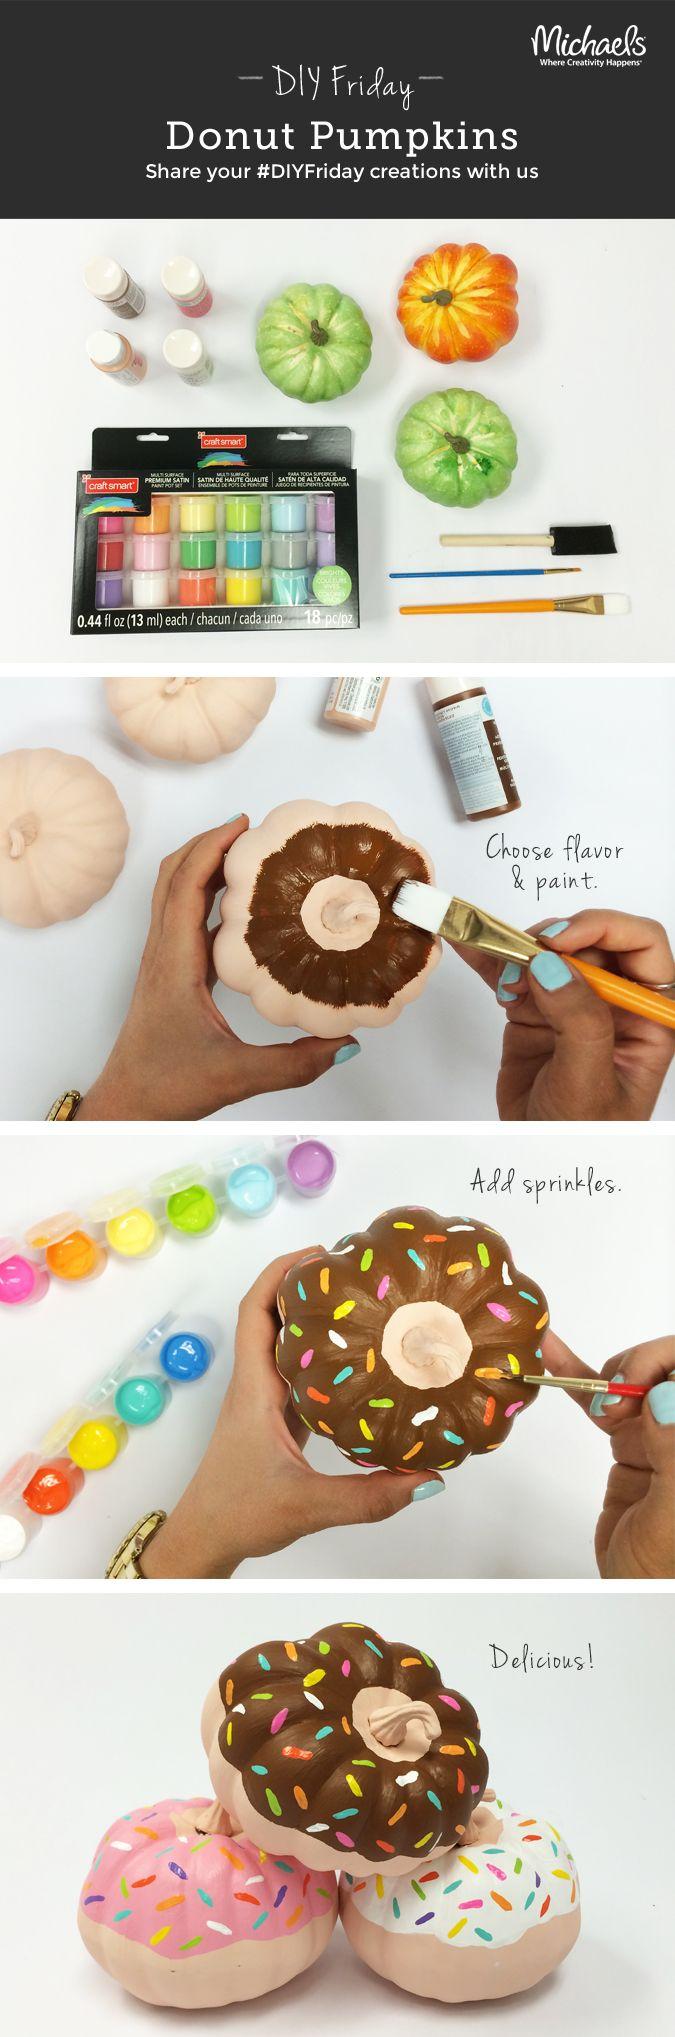 DIY Painted Donut Mini Pumpkins